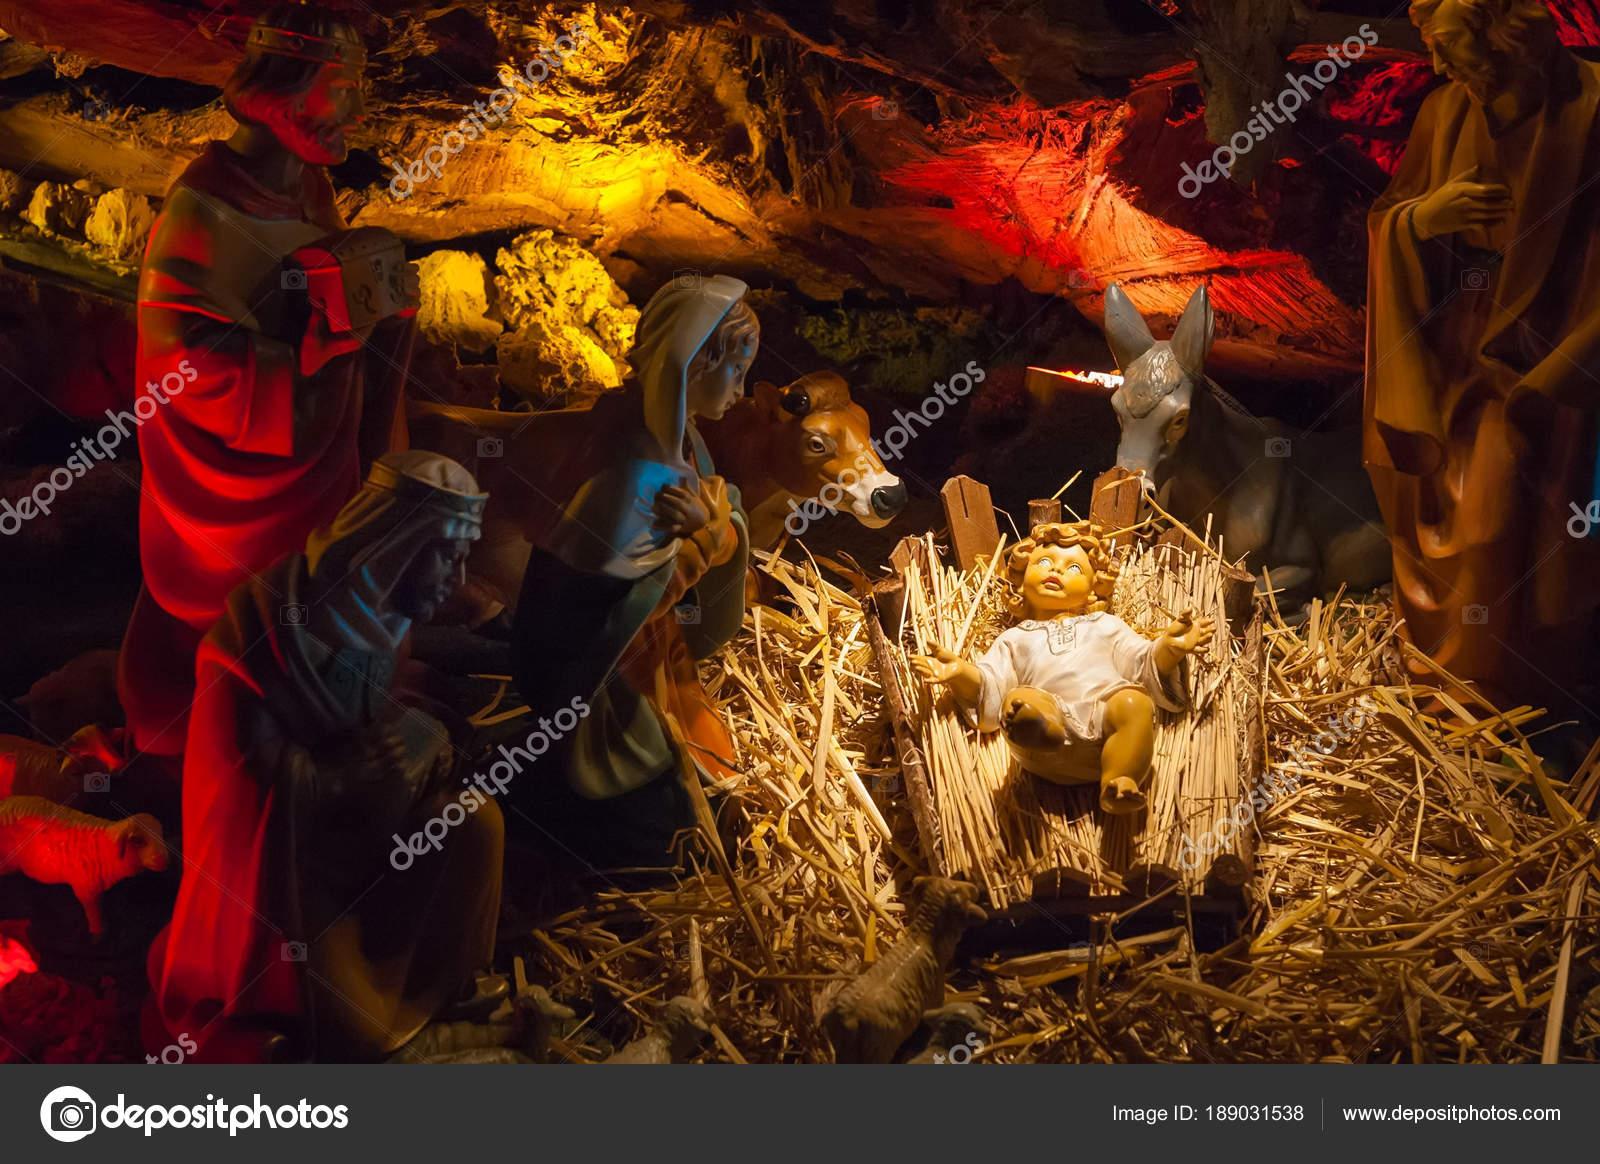 Immagini Natale Sacre.Immagini Sacre Natale Jpg Presepe Di Natale Con Sacra